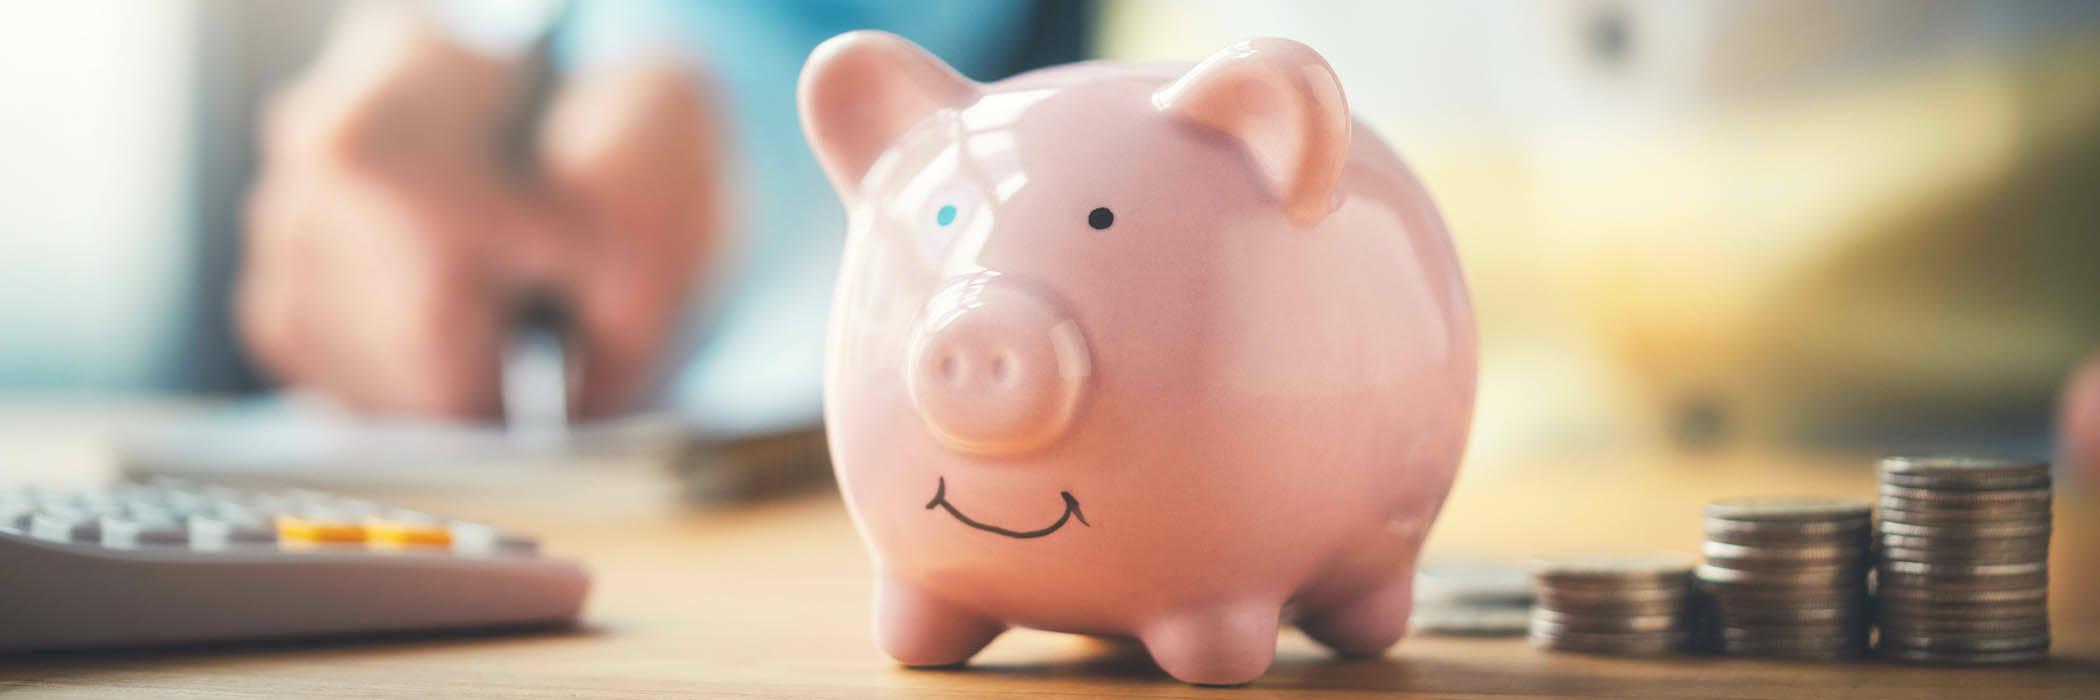 21may deposit guarantee scheme hero